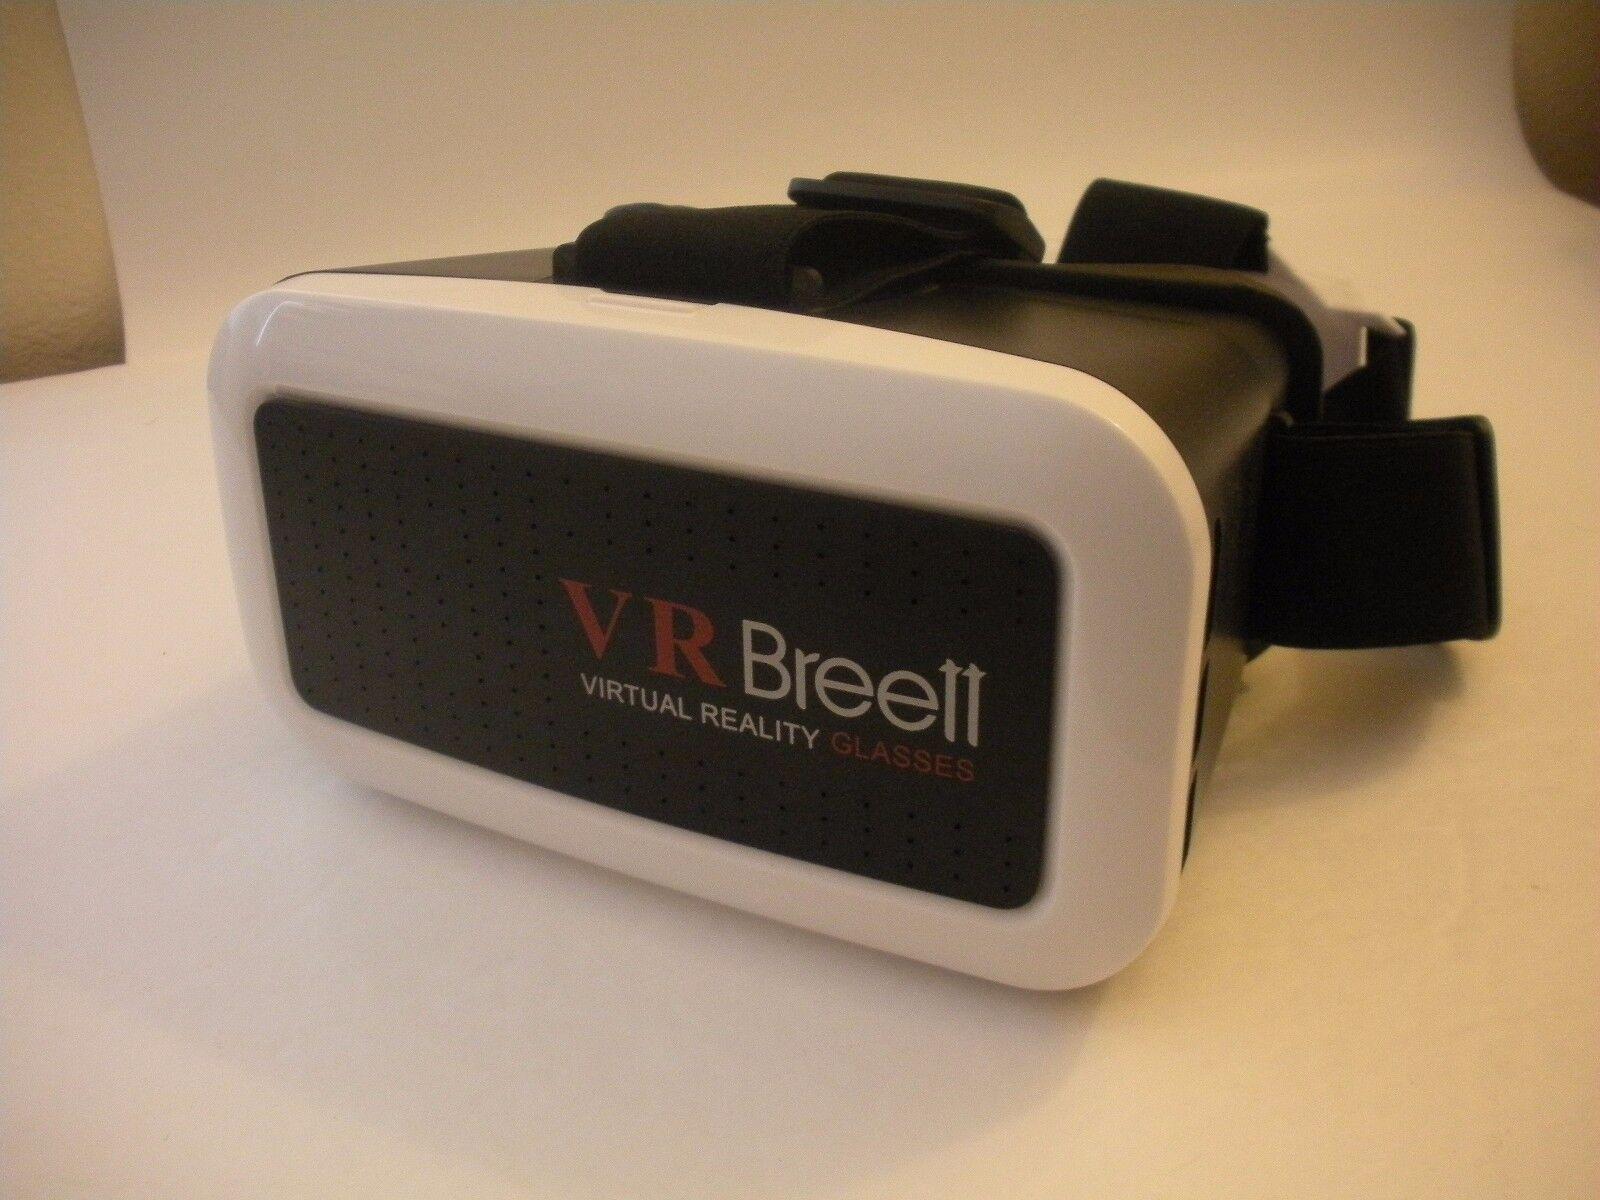 VR Breett  3D Virtual Reality Headset Glasses